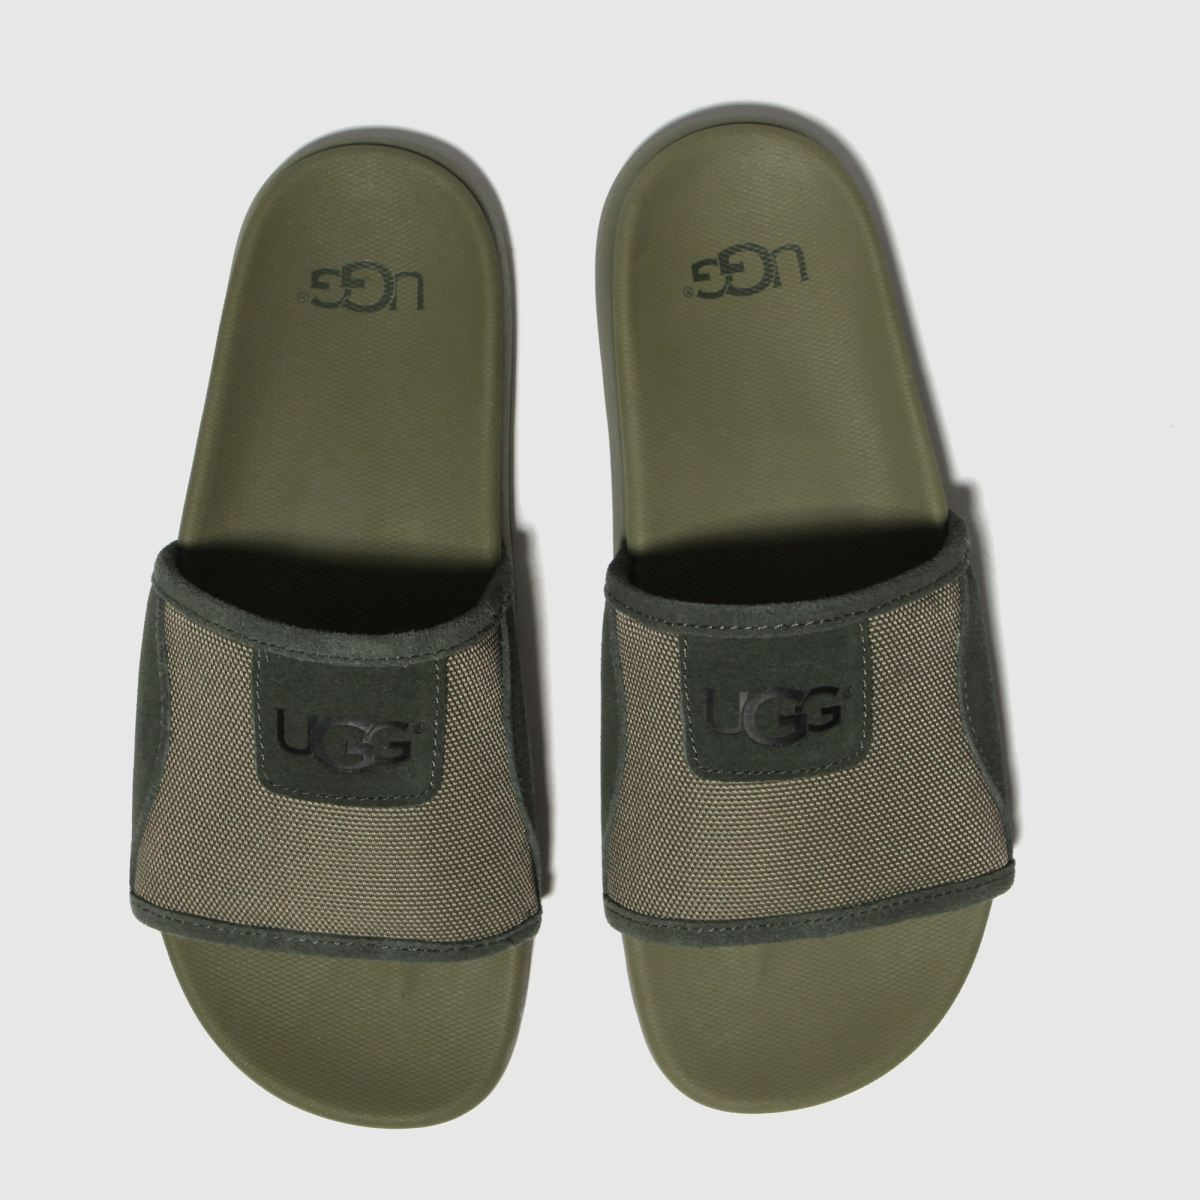 Ugg Green Xavier Ballistic Slide Sandals